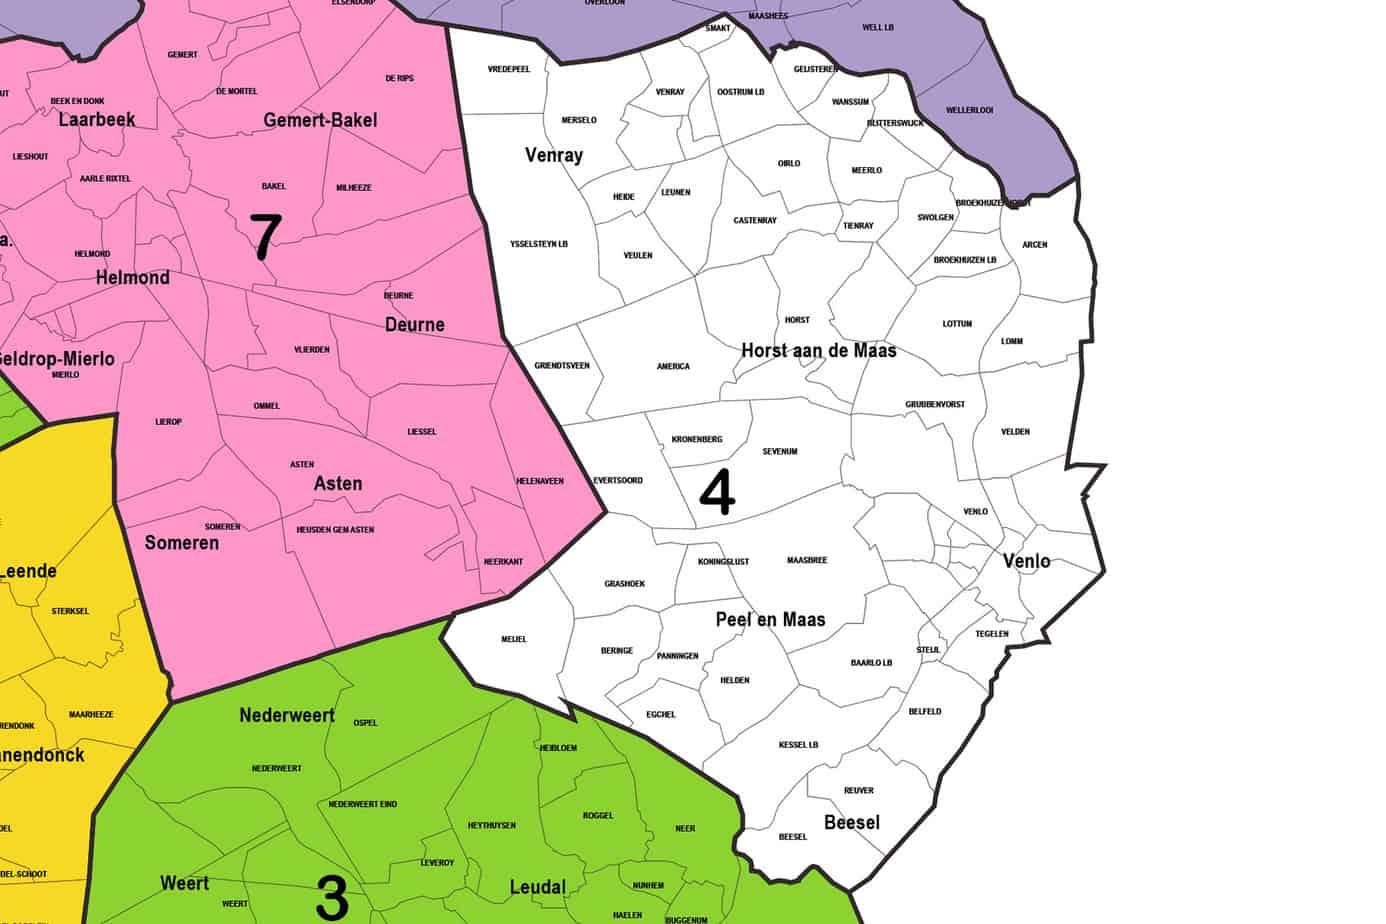 Regio 4 - Venlo